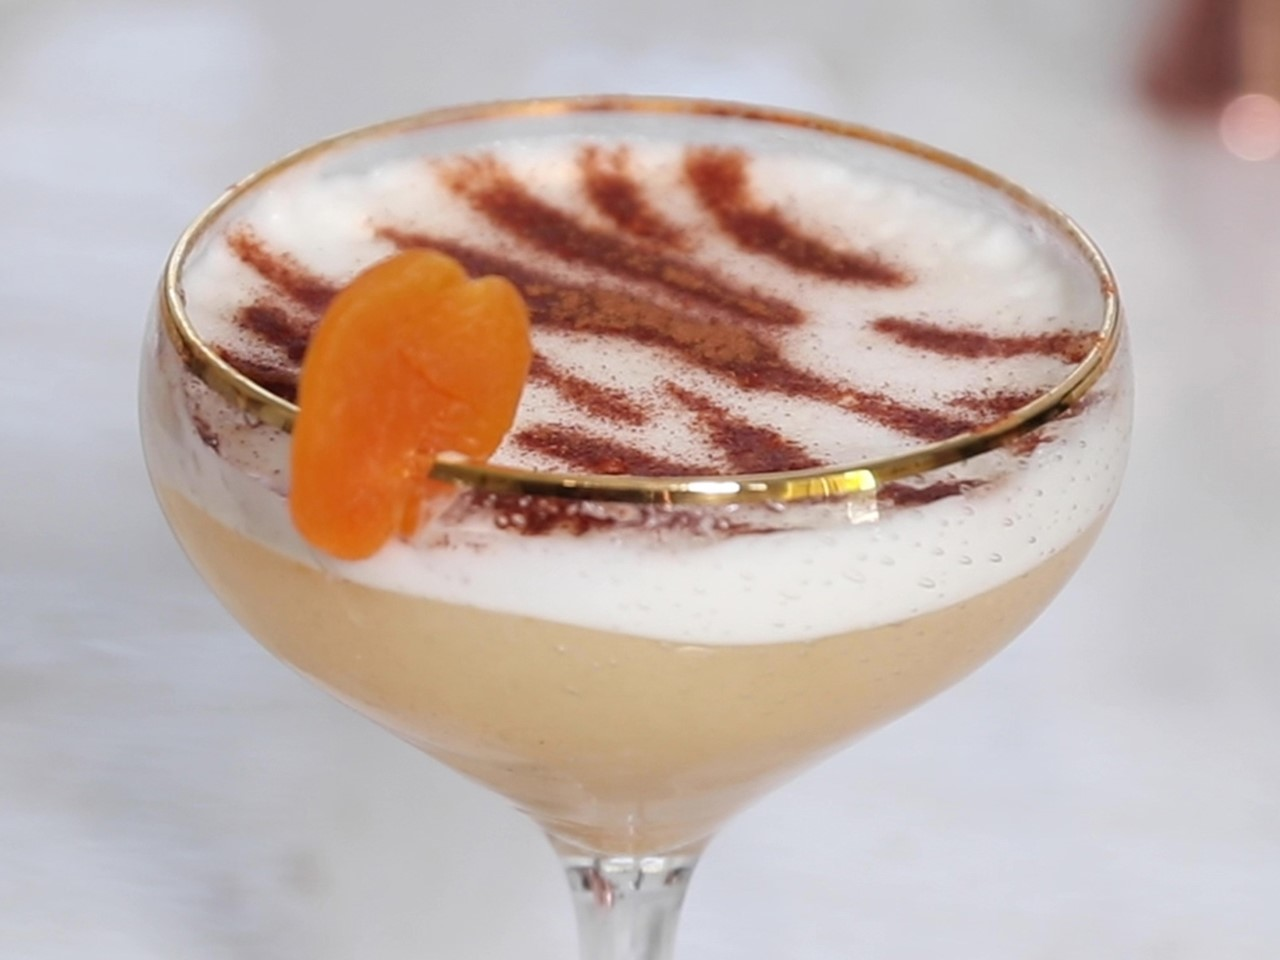 wd - Spiced *Exotic* Apricot Bourbon Sour Image